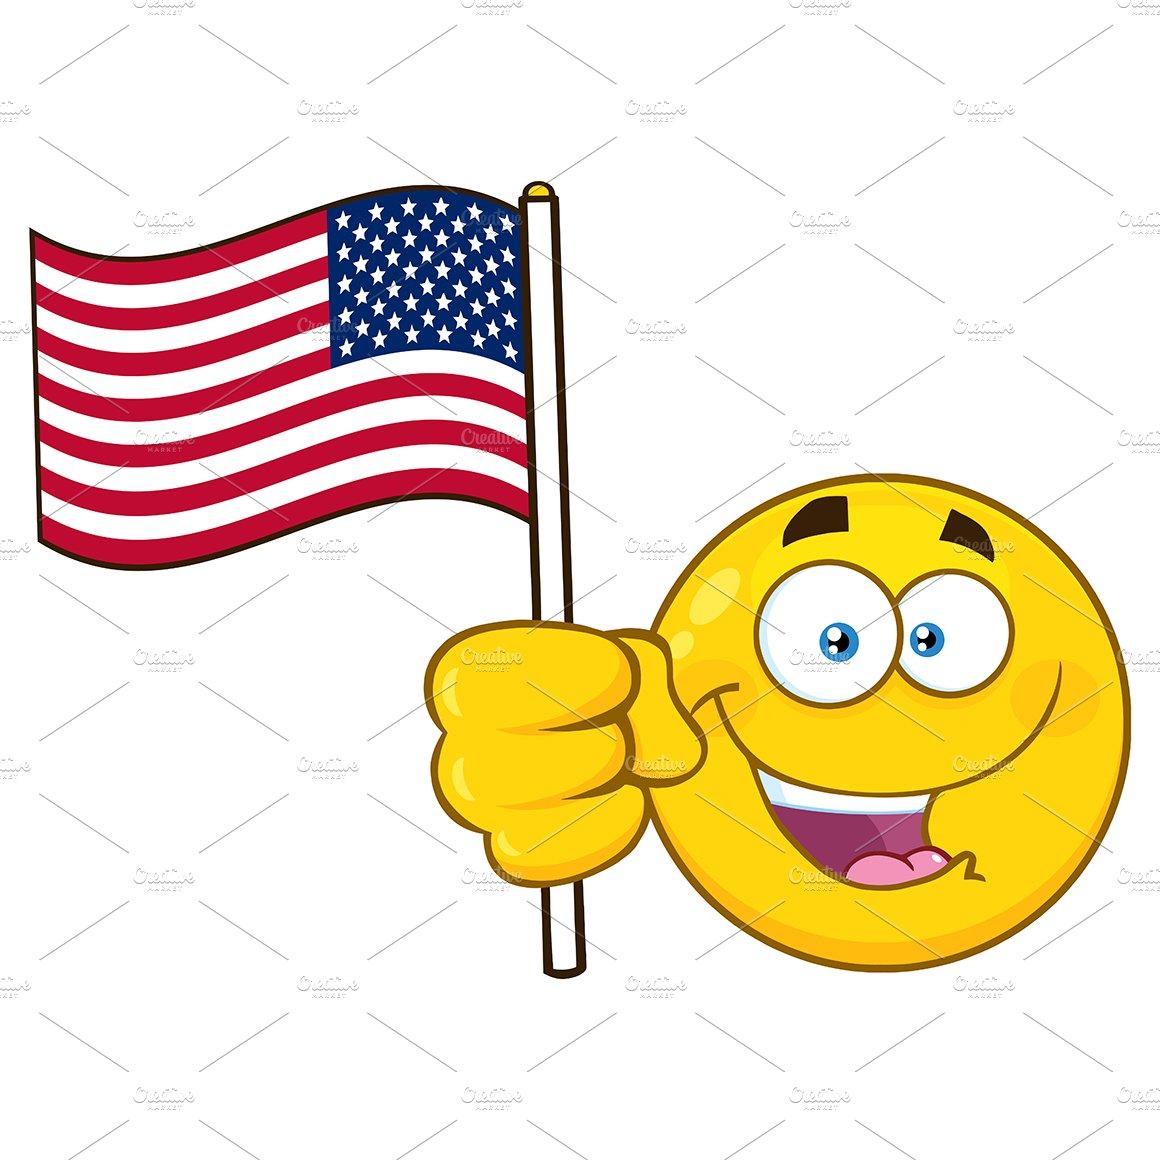 Emoji Face Waving An American Flag ~ Illustrations ...